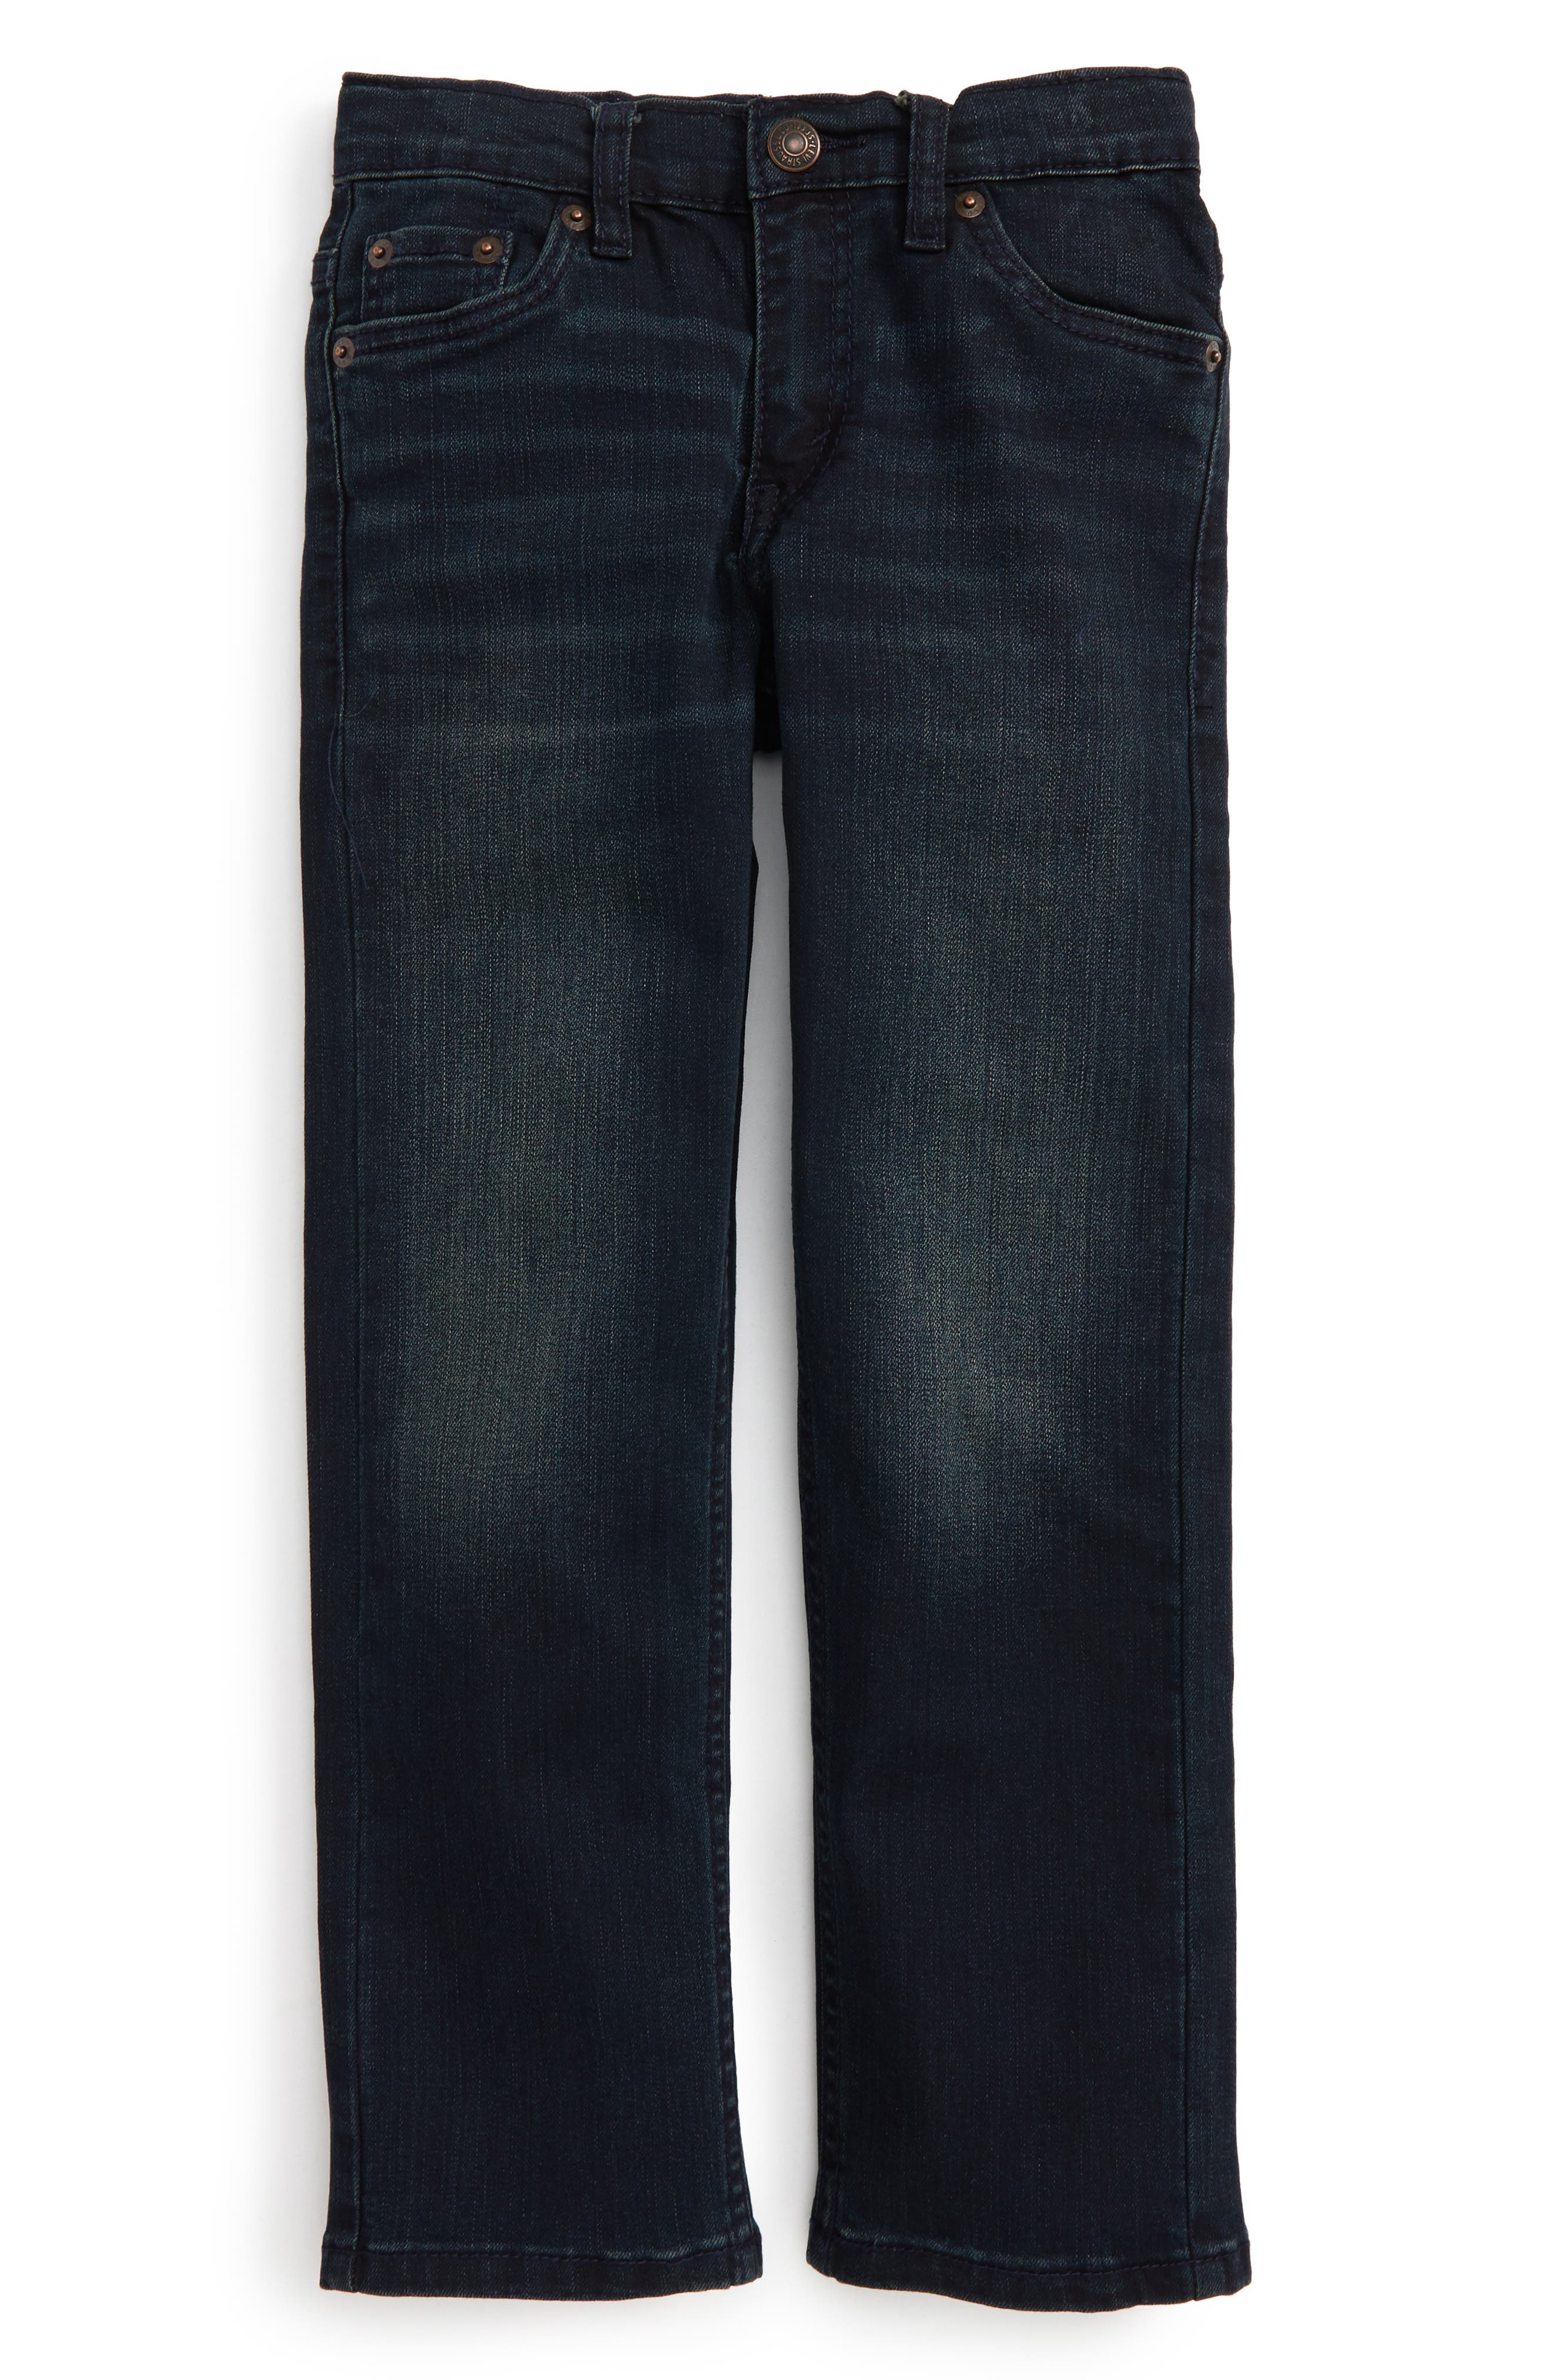 Levi's® 511 Slim Fit Jeans (Toddler Boys & Little Boys)